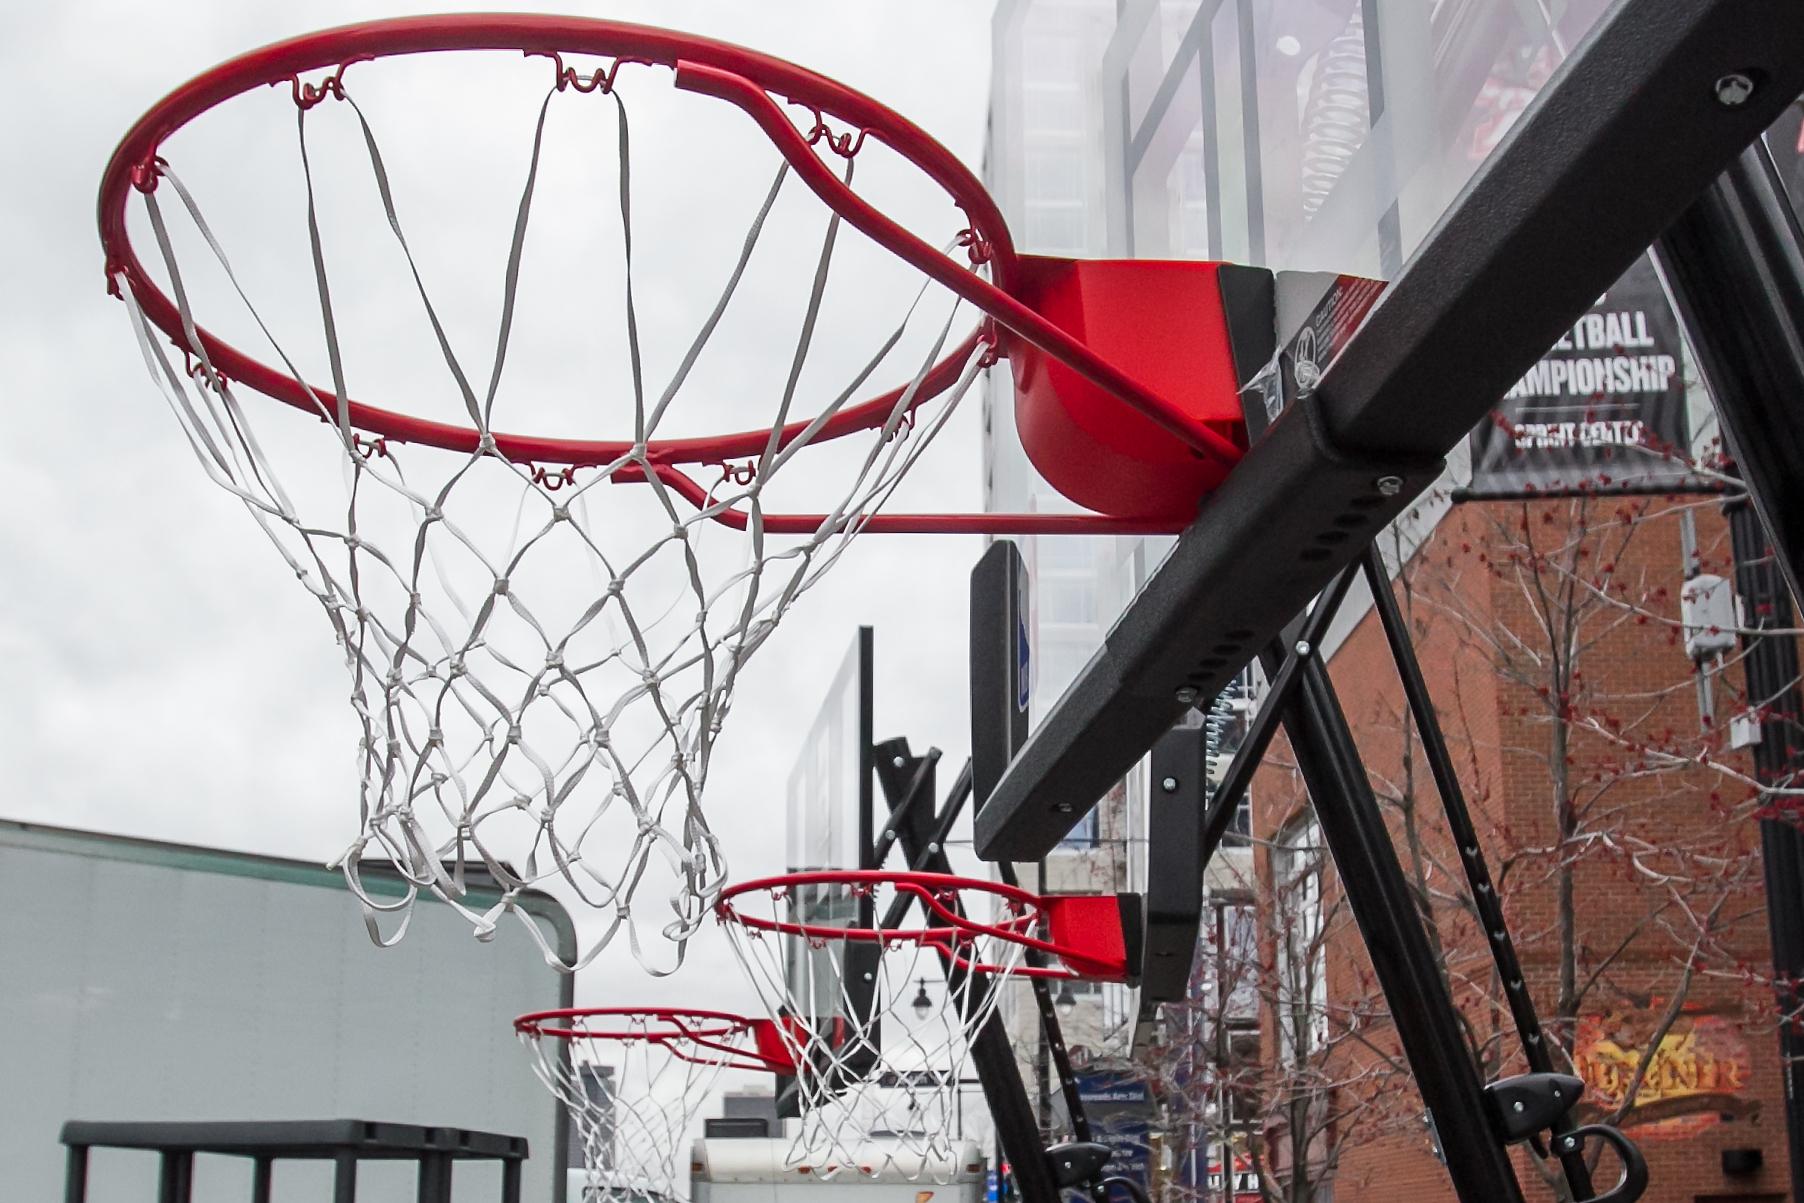 COLLEGE BASKETBALL: MAR 12 Big 12 Tournament